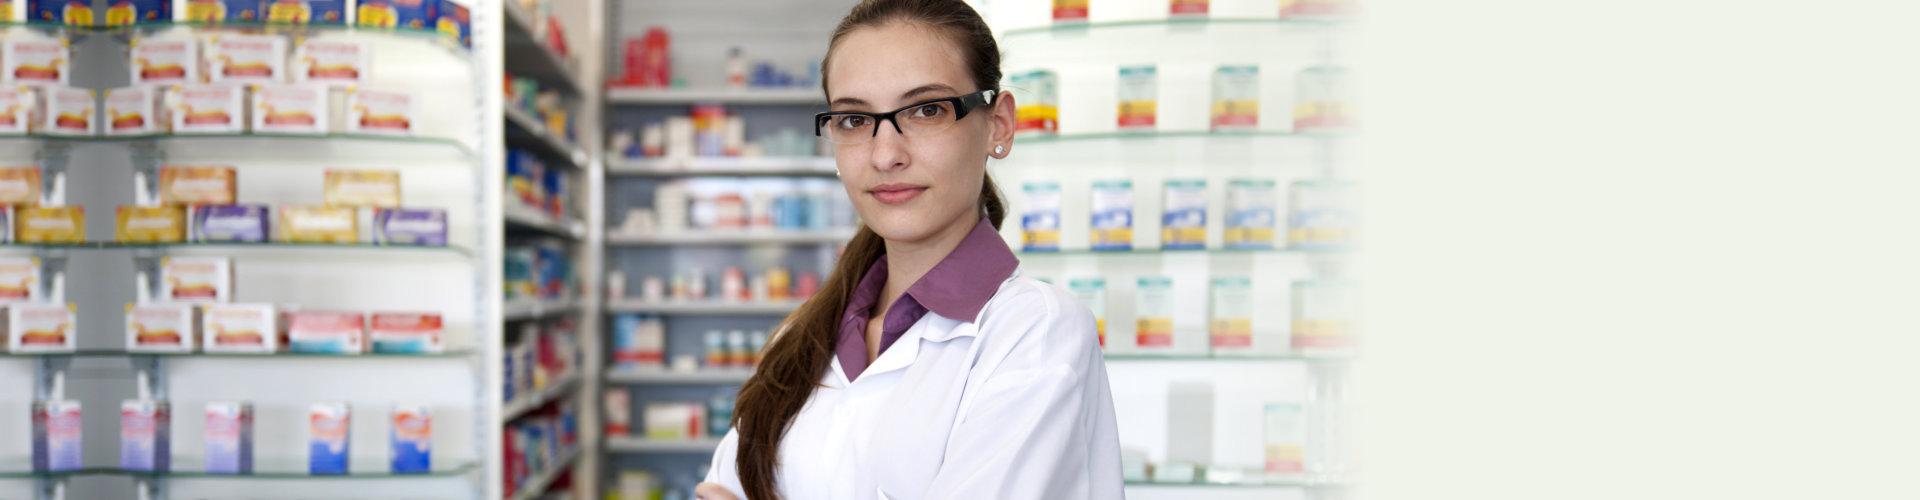 female pharmacist at pharmacy